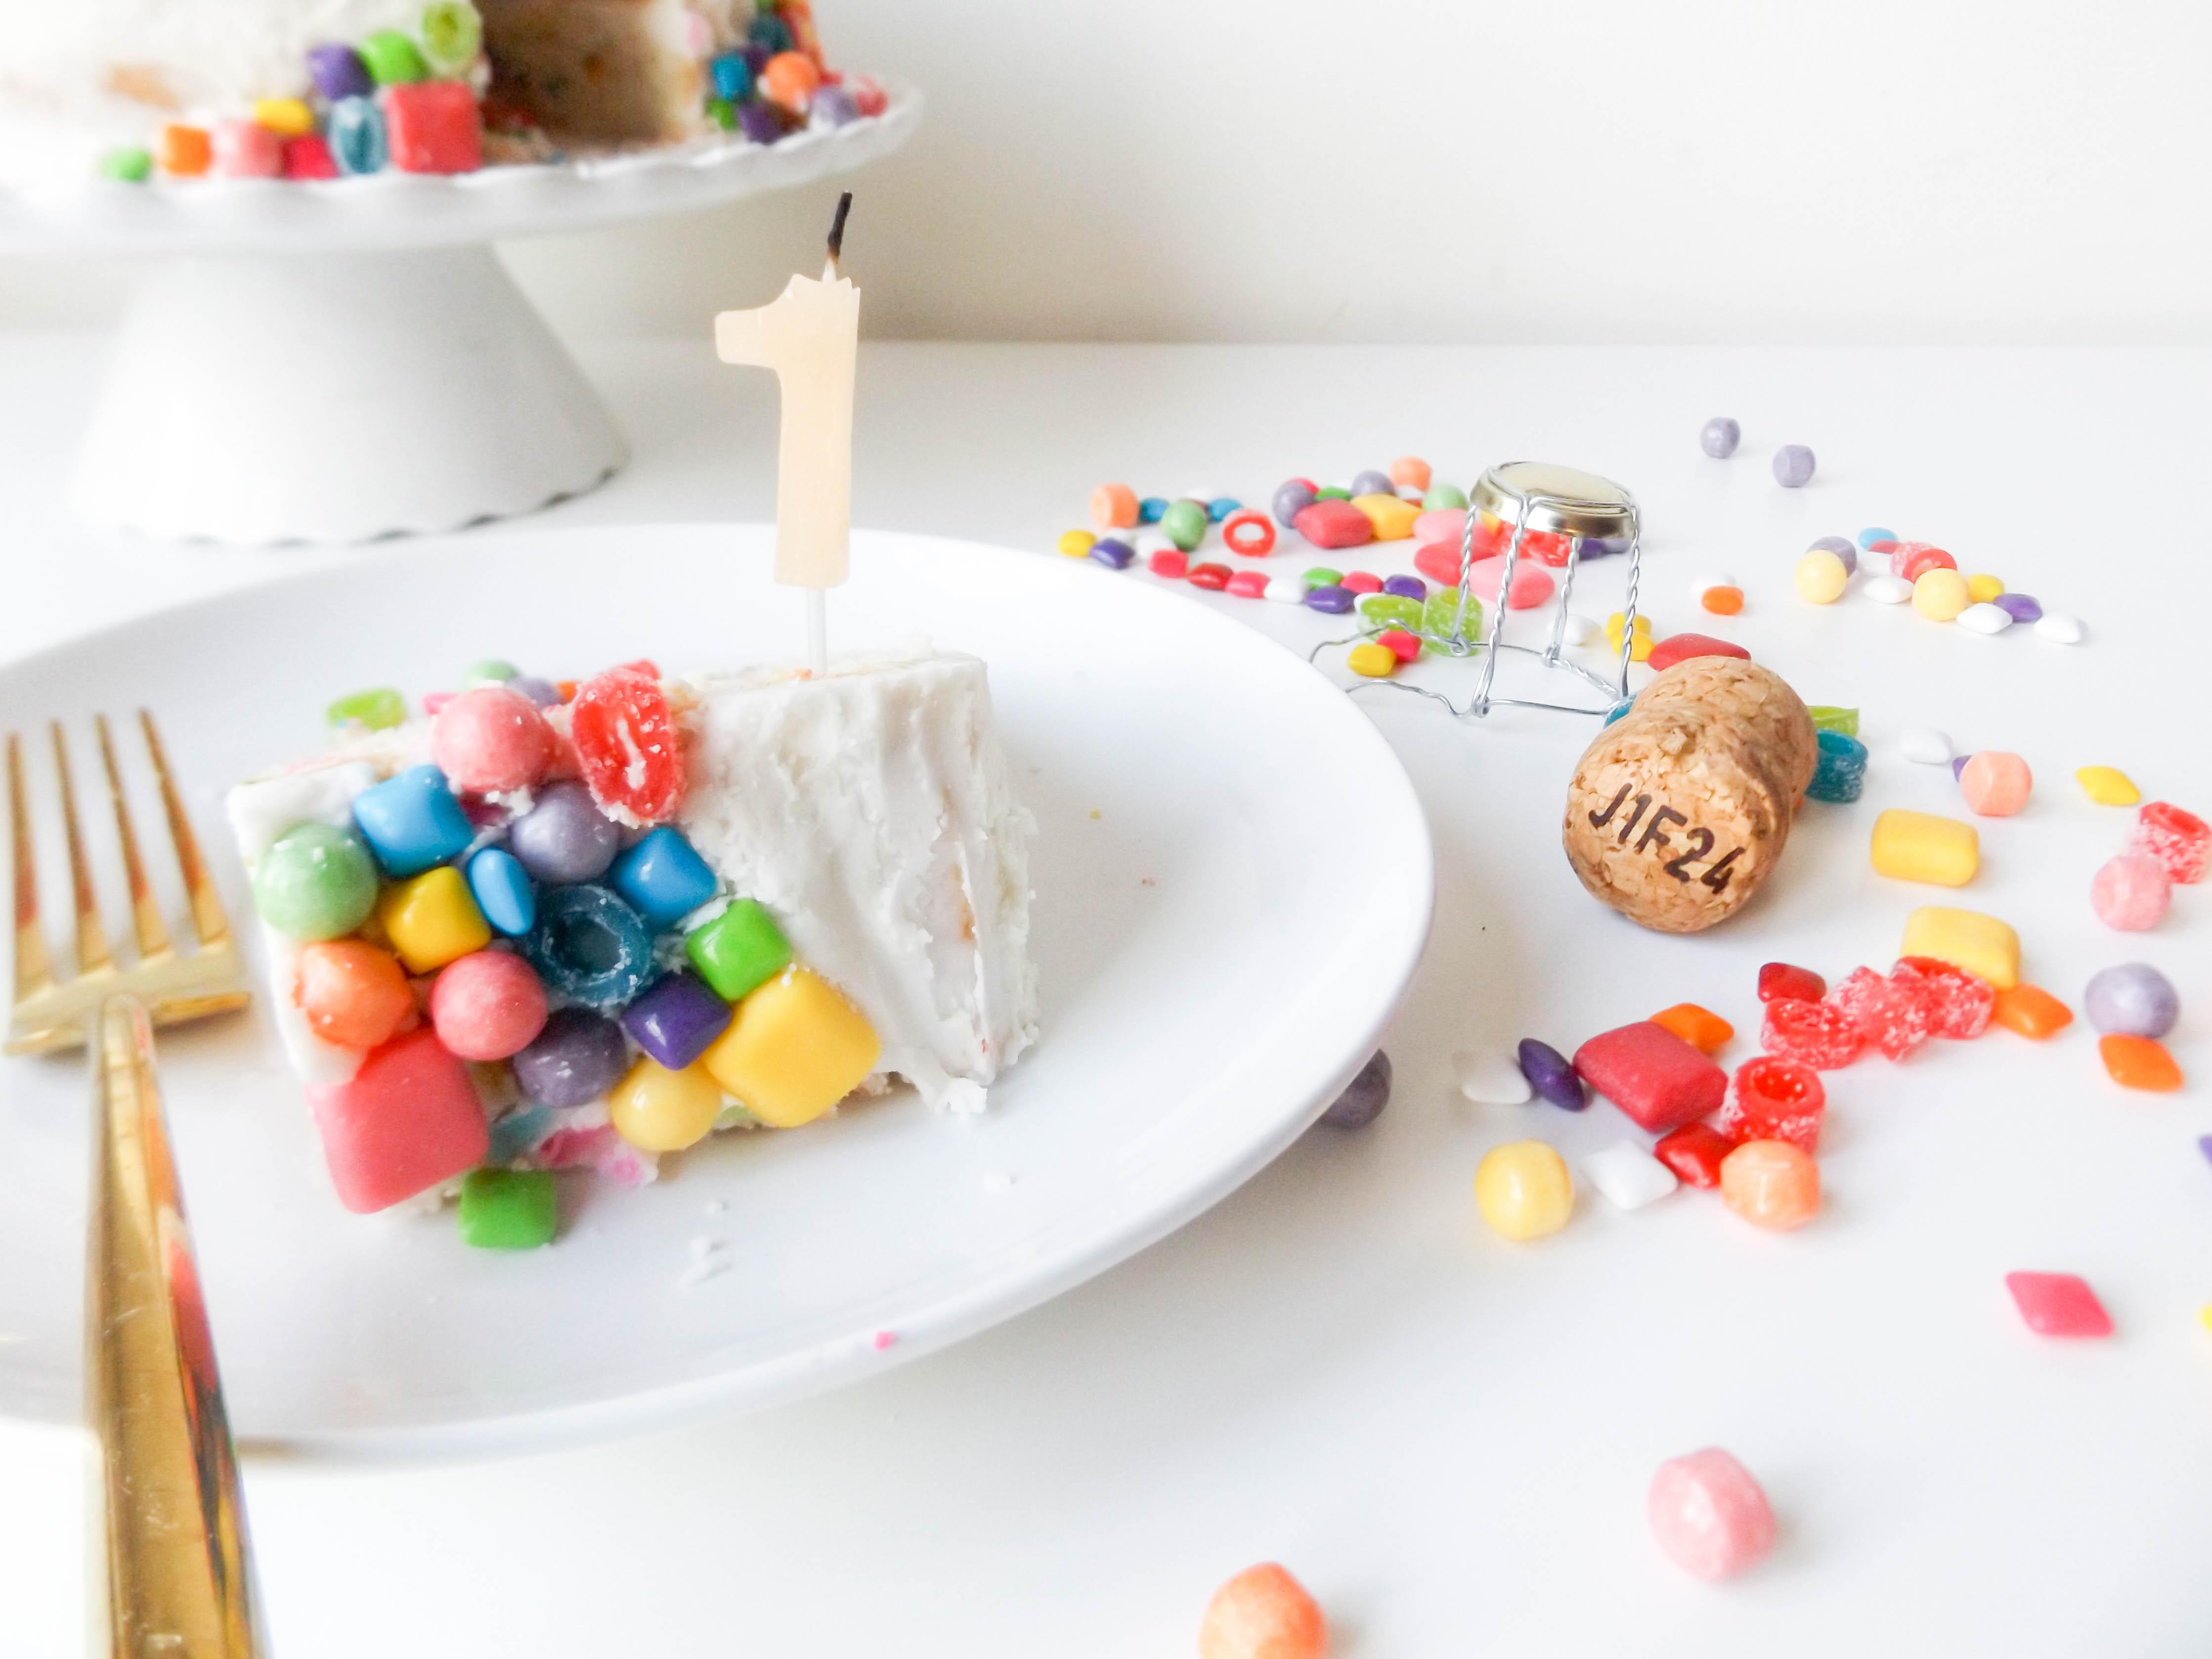 Year one Blogiversary & Molly Yeh's Funfetti Cake